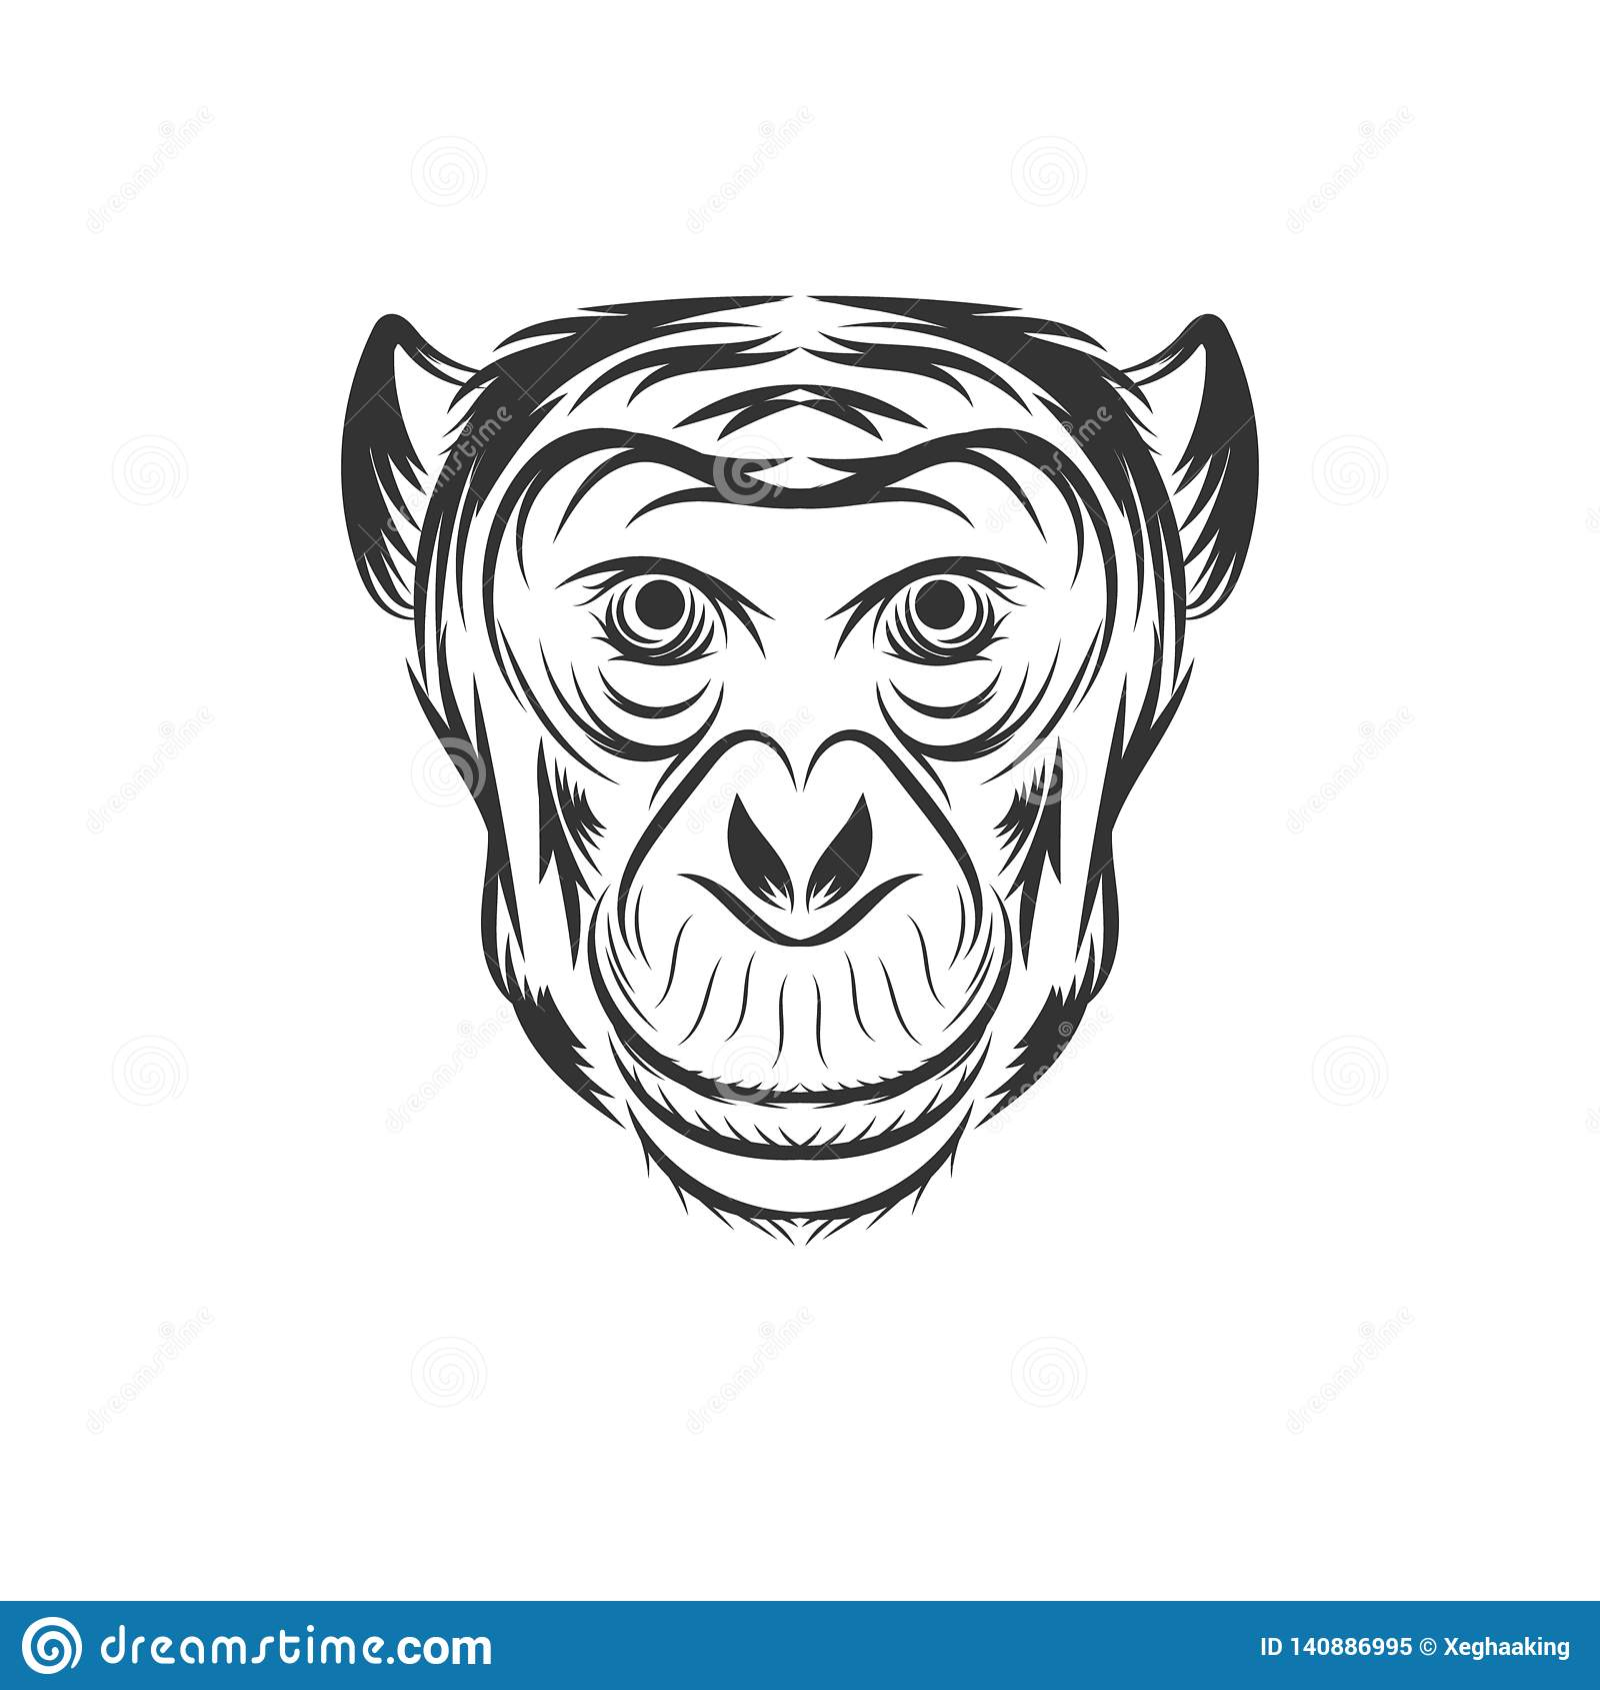 Monkey face illustration design